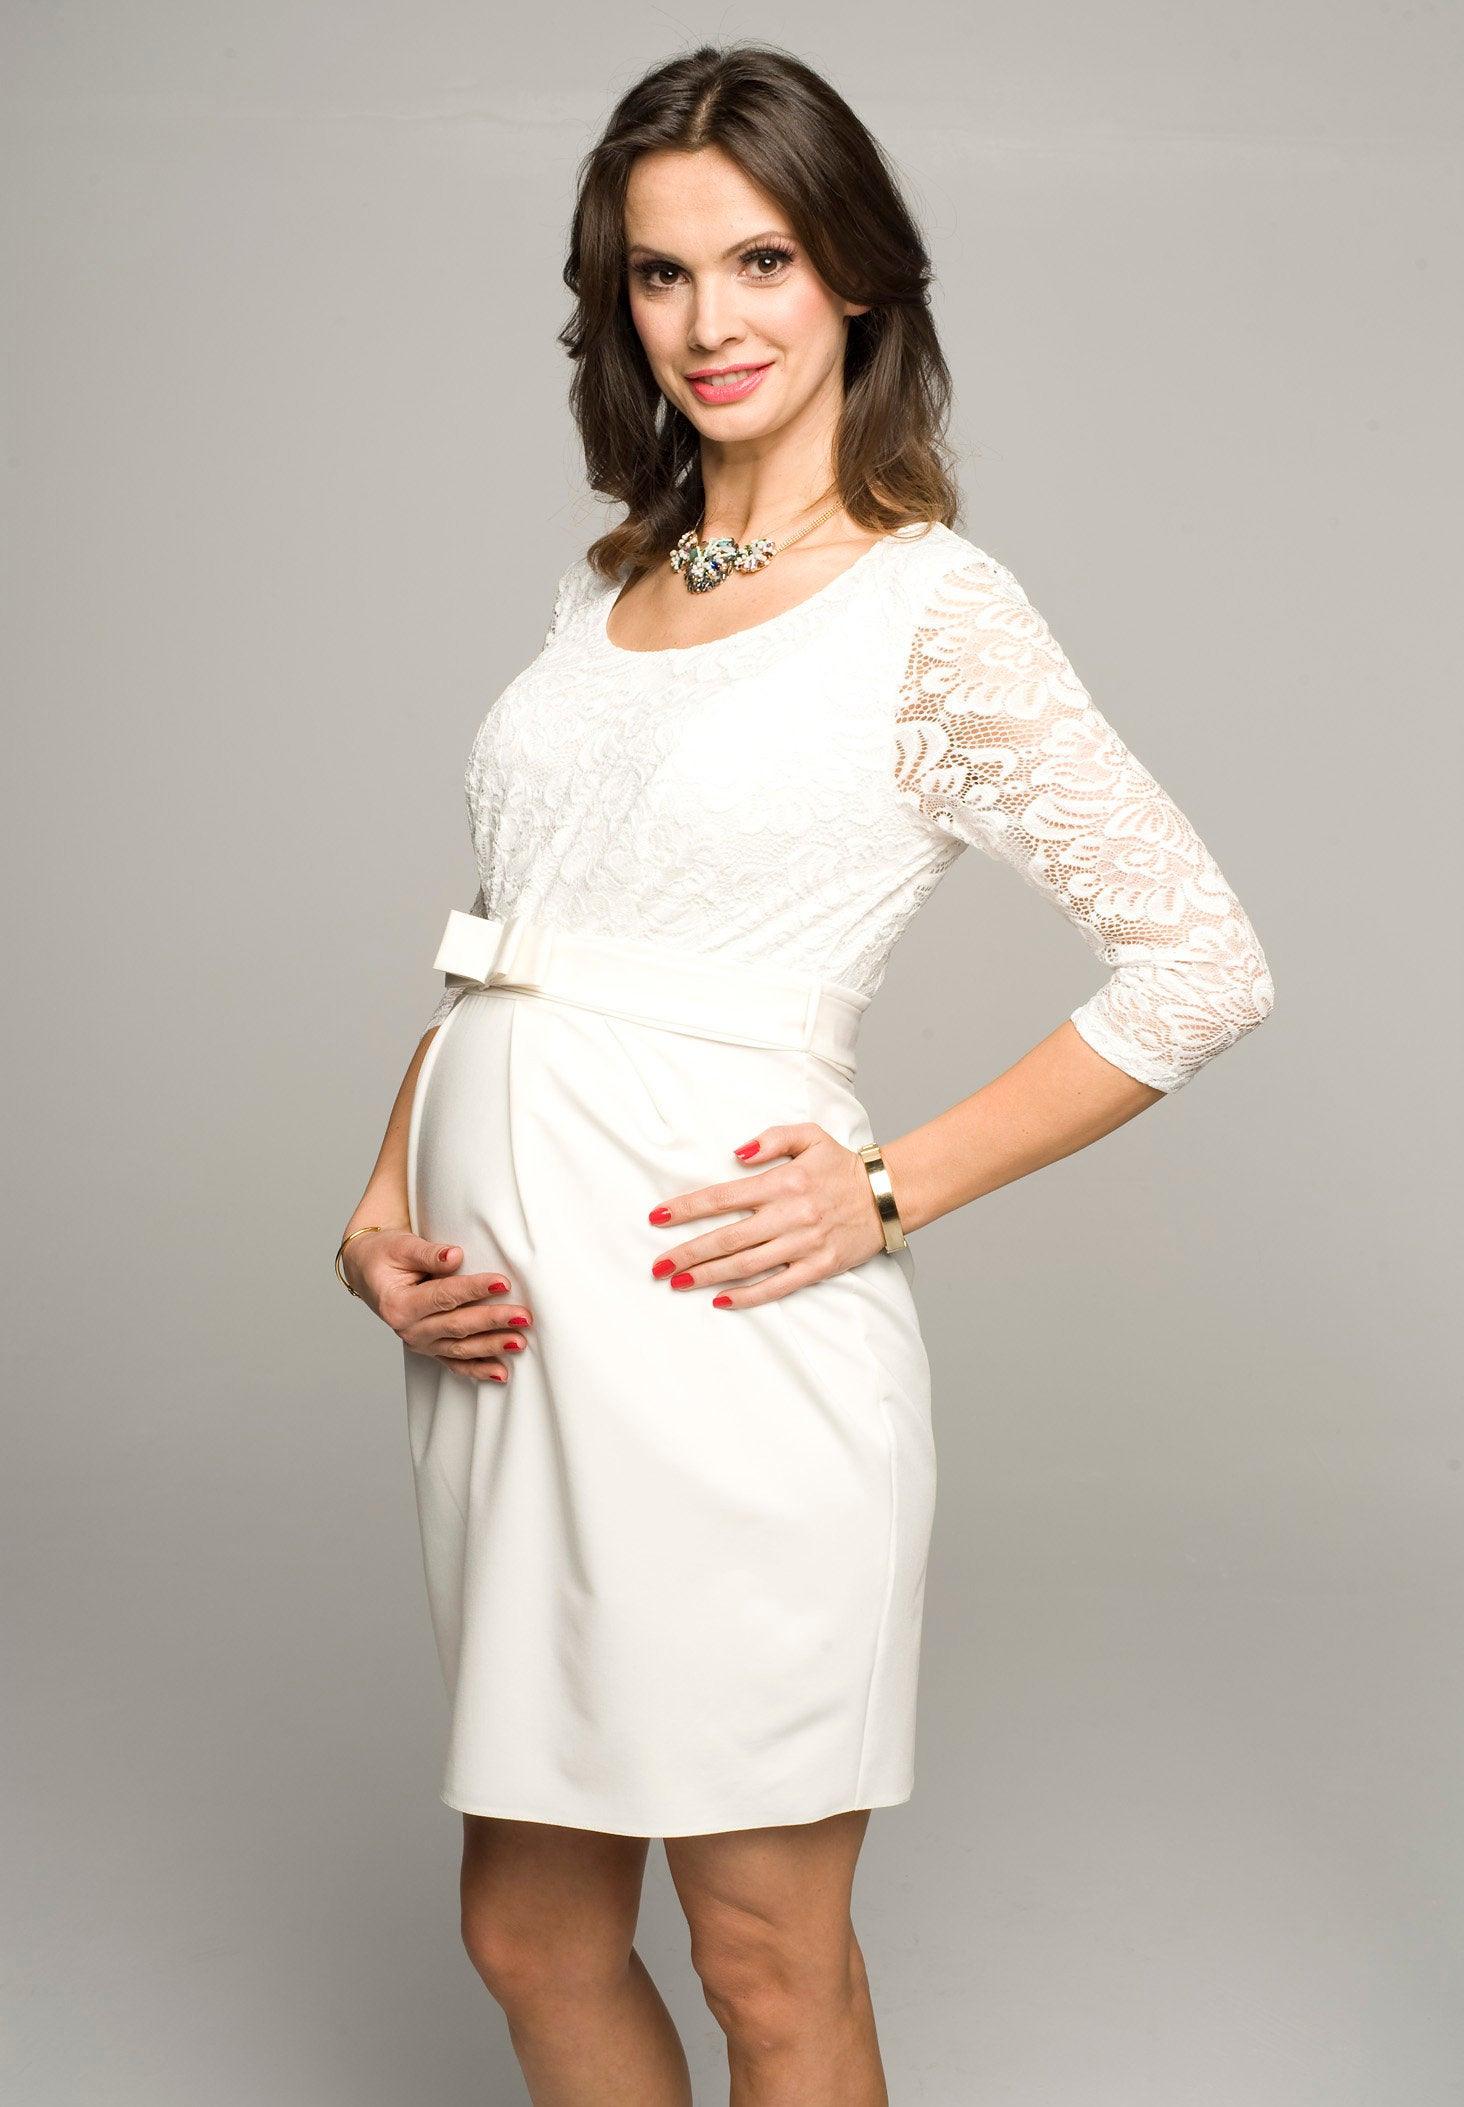 Umstandskleid Hochzeitskleid Umstandsmode Brautmode